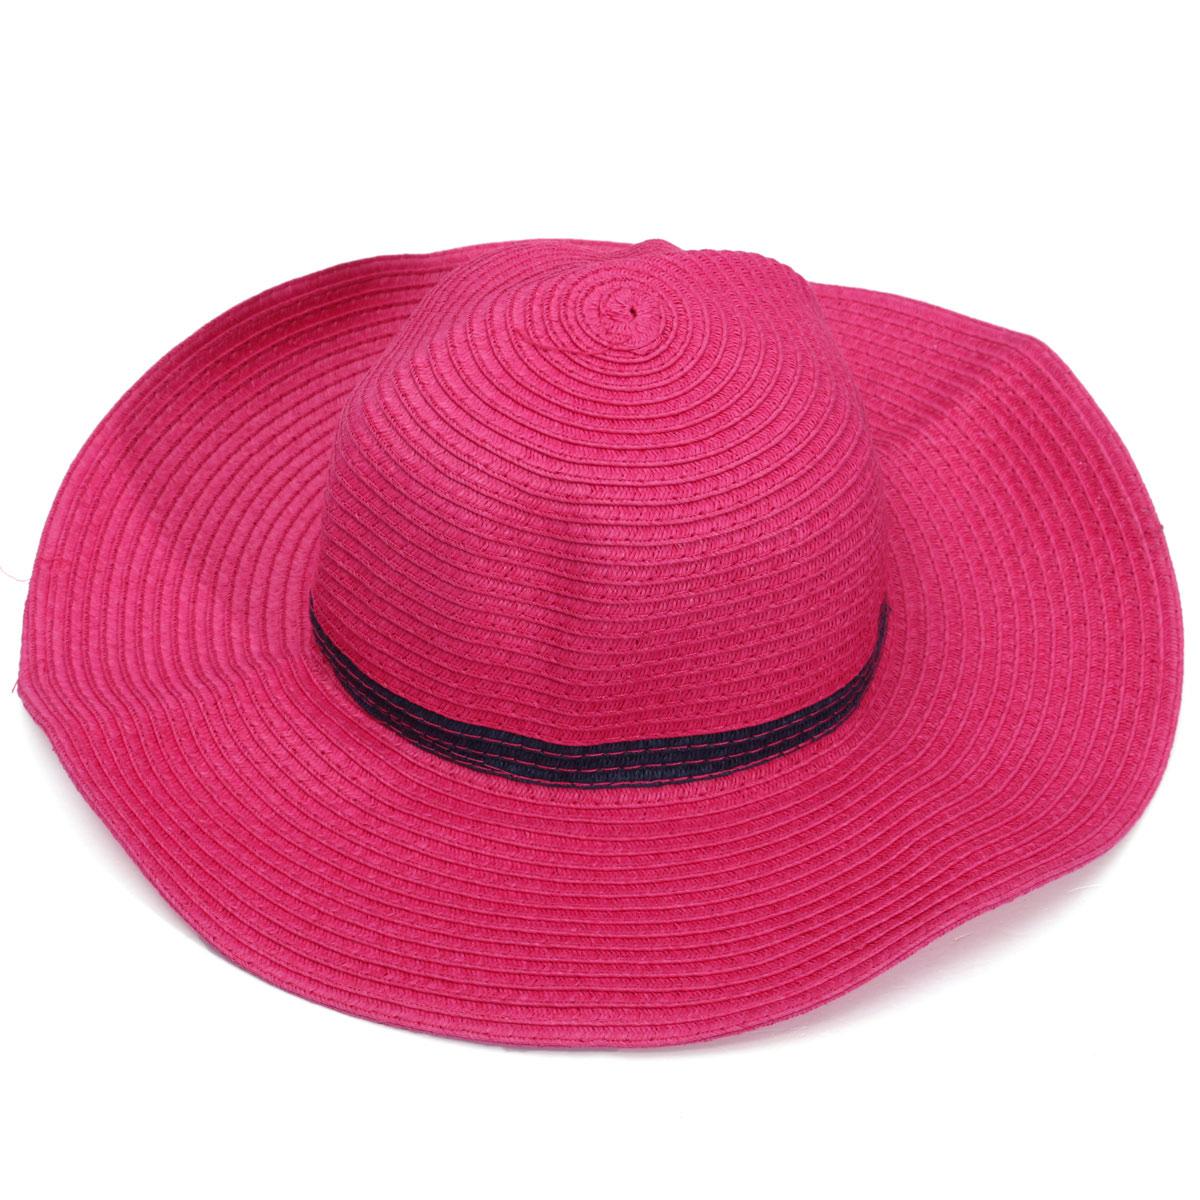 Fashion Kid Girls Summer Roll Up Wide Large Brim Sun Straw Beach Hats Cap Hat